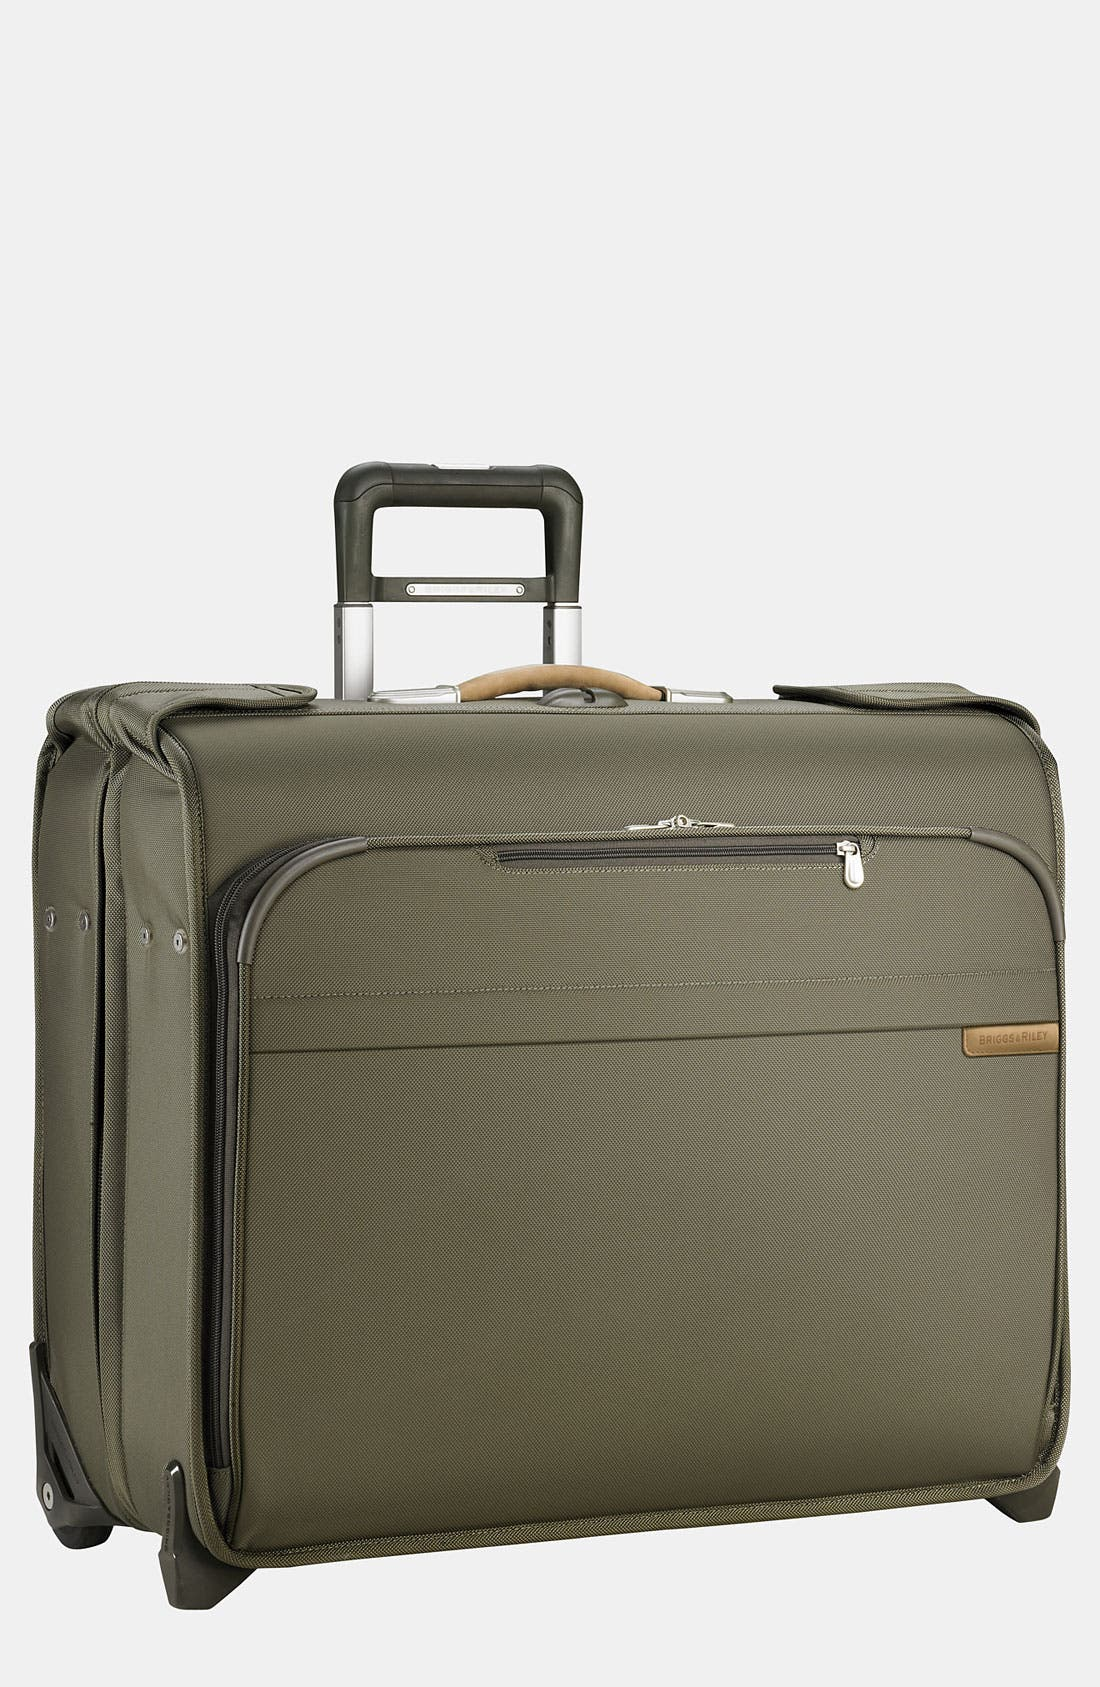 'Baseline - Deluxe' Rolling Garment Bag,                             Main thumbnail 1, color,                             OLIVE